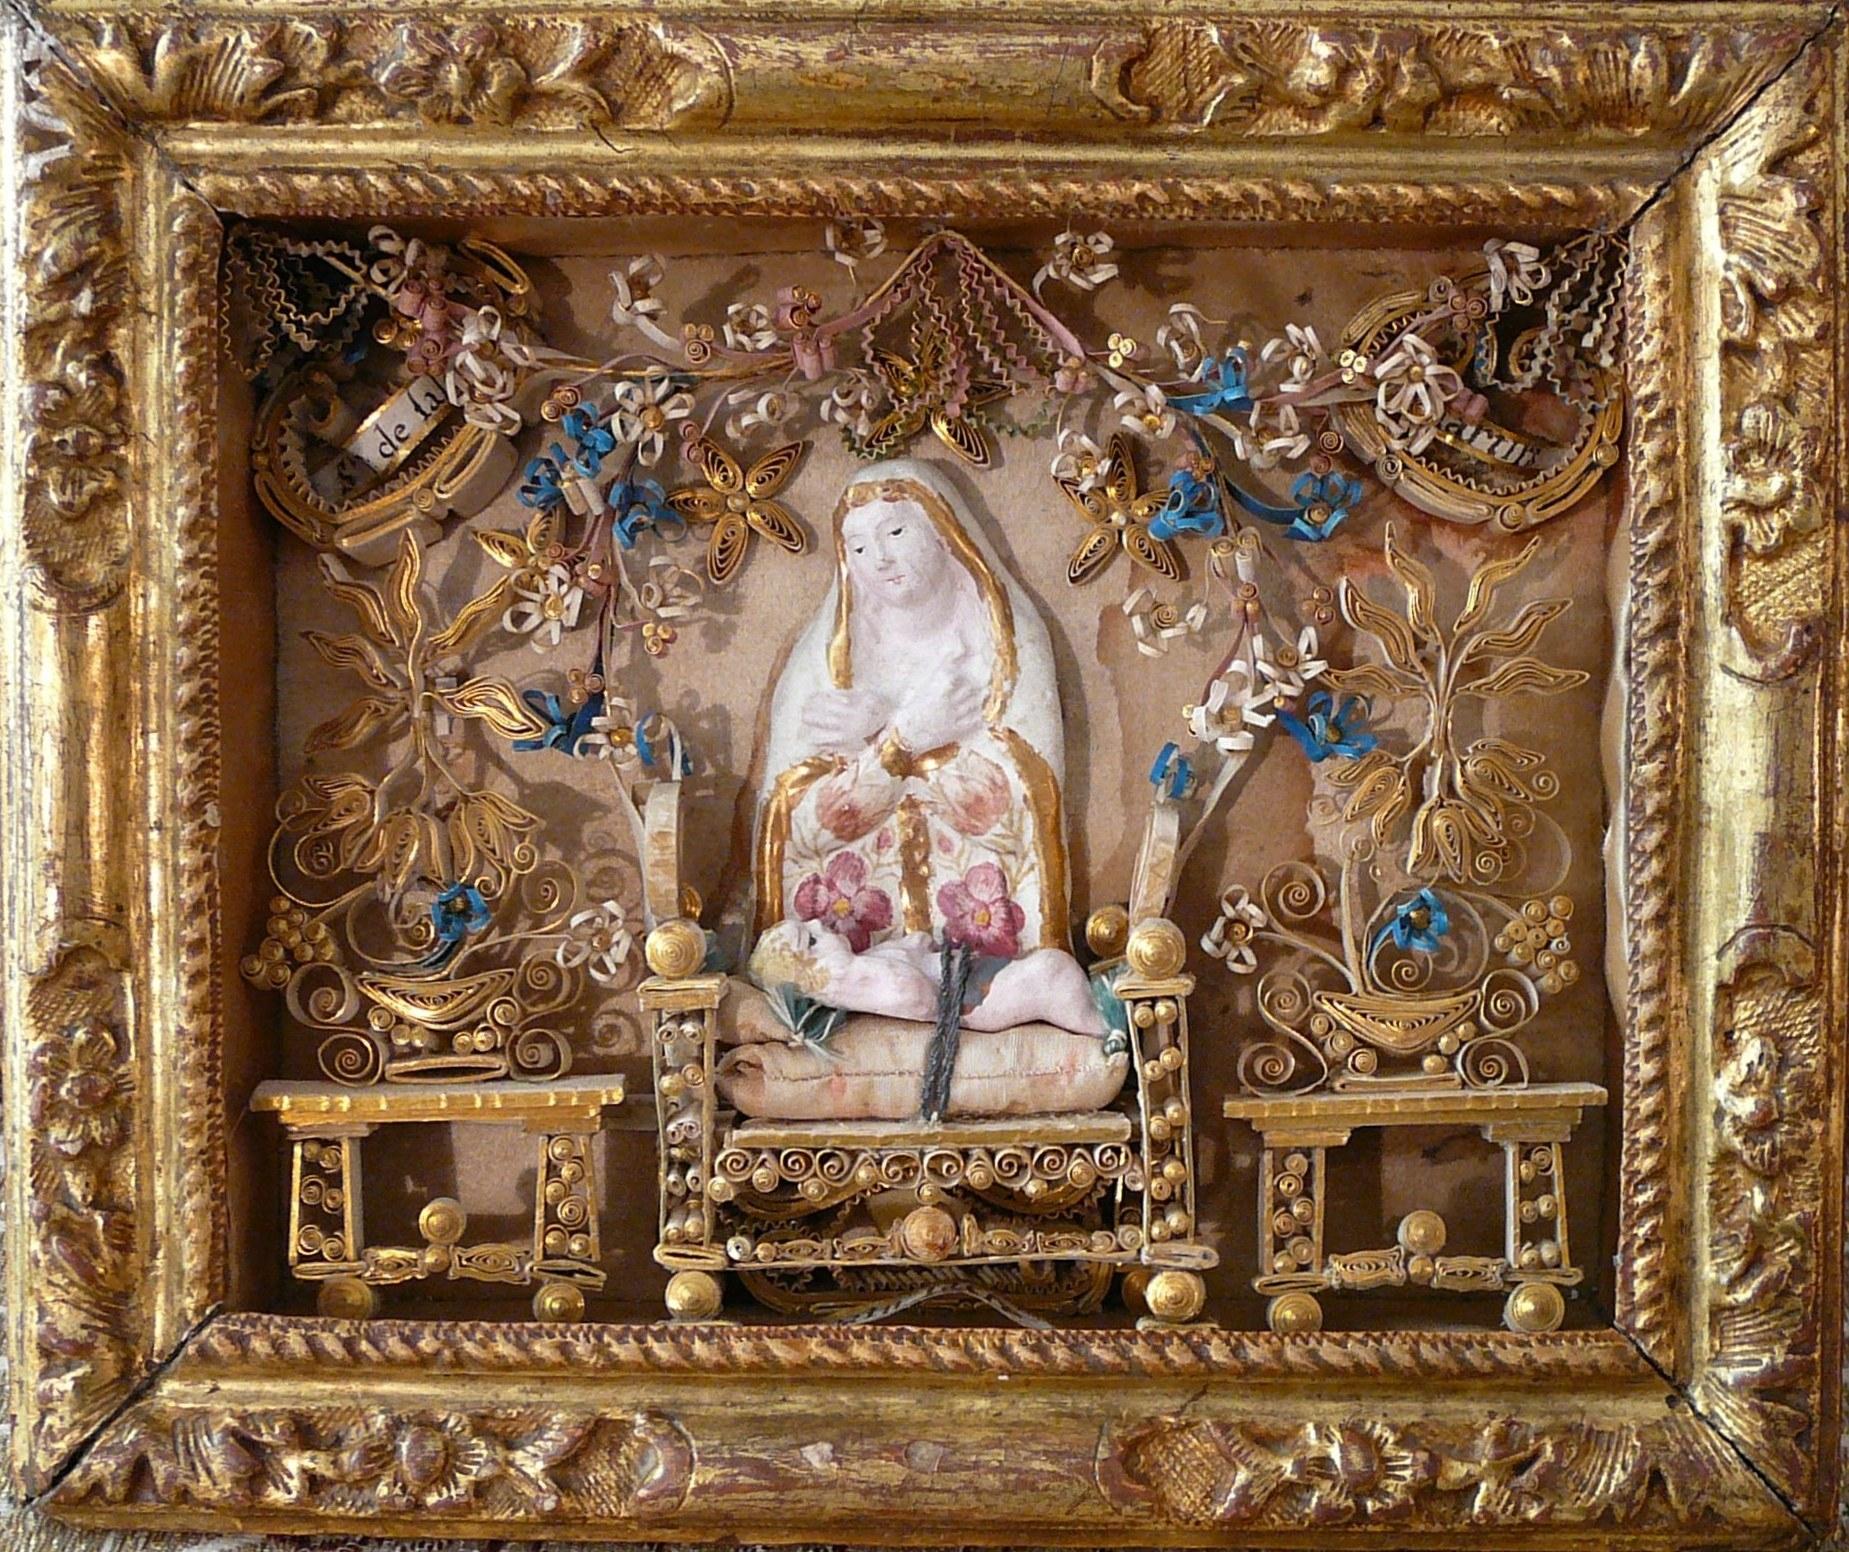 Piete maternelle